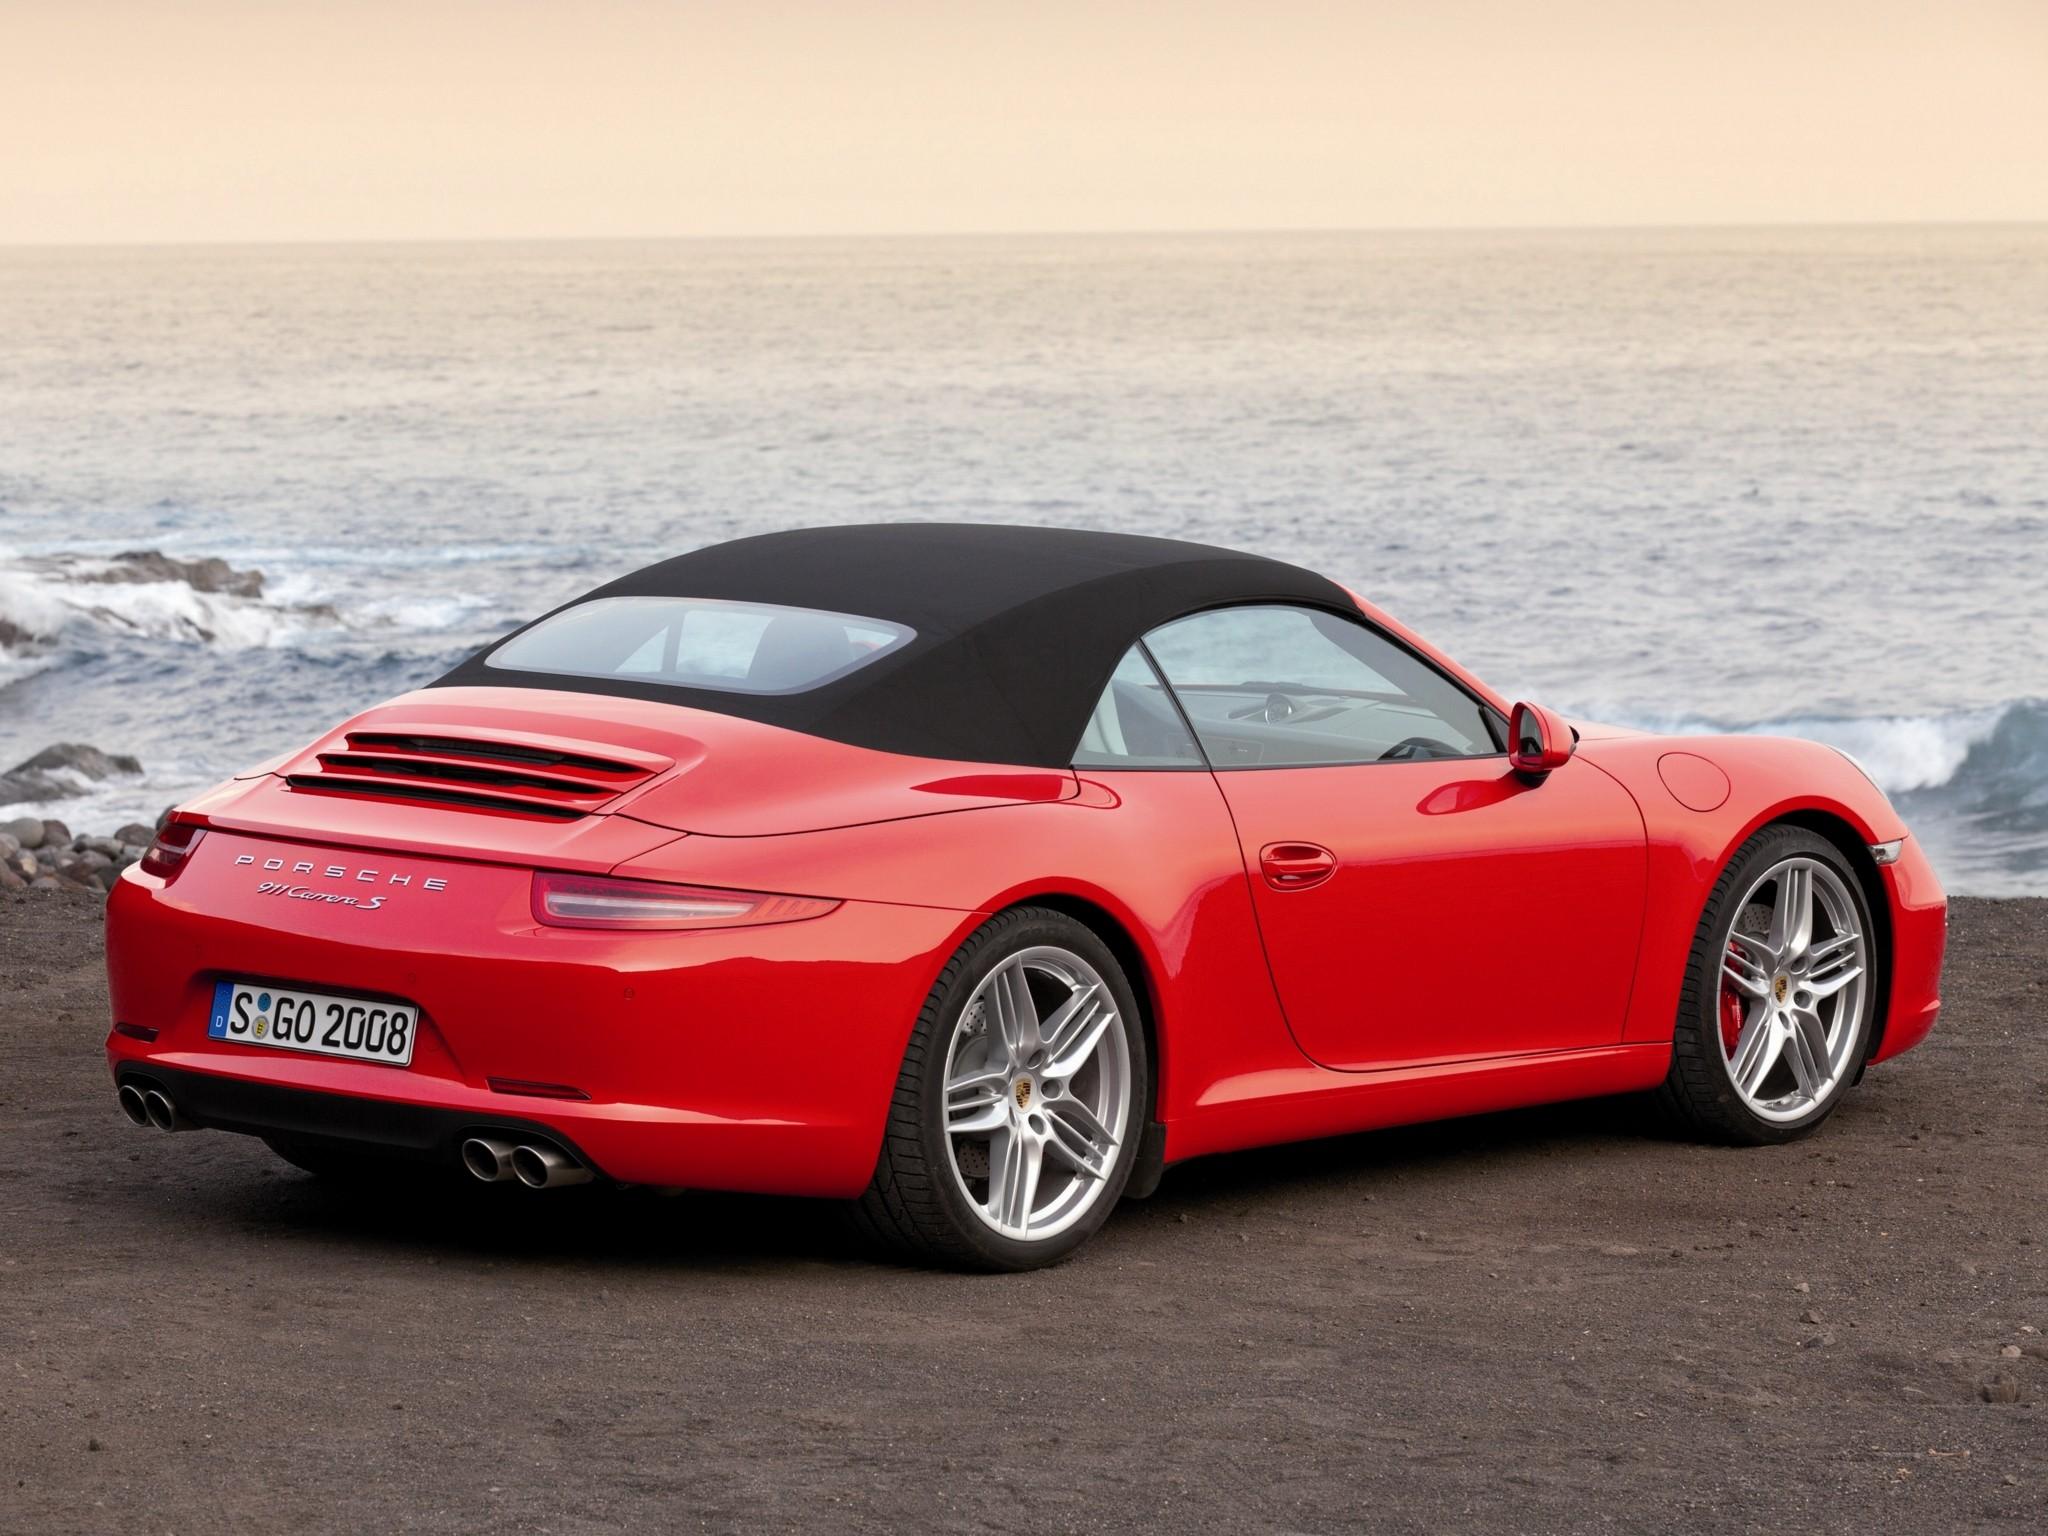 porsche 911 carrera s cabriolet 991 specs photos 2012 2013 2014 2015 autoevolution. Black Bedroom Furniture Sets. Home Design Ideas